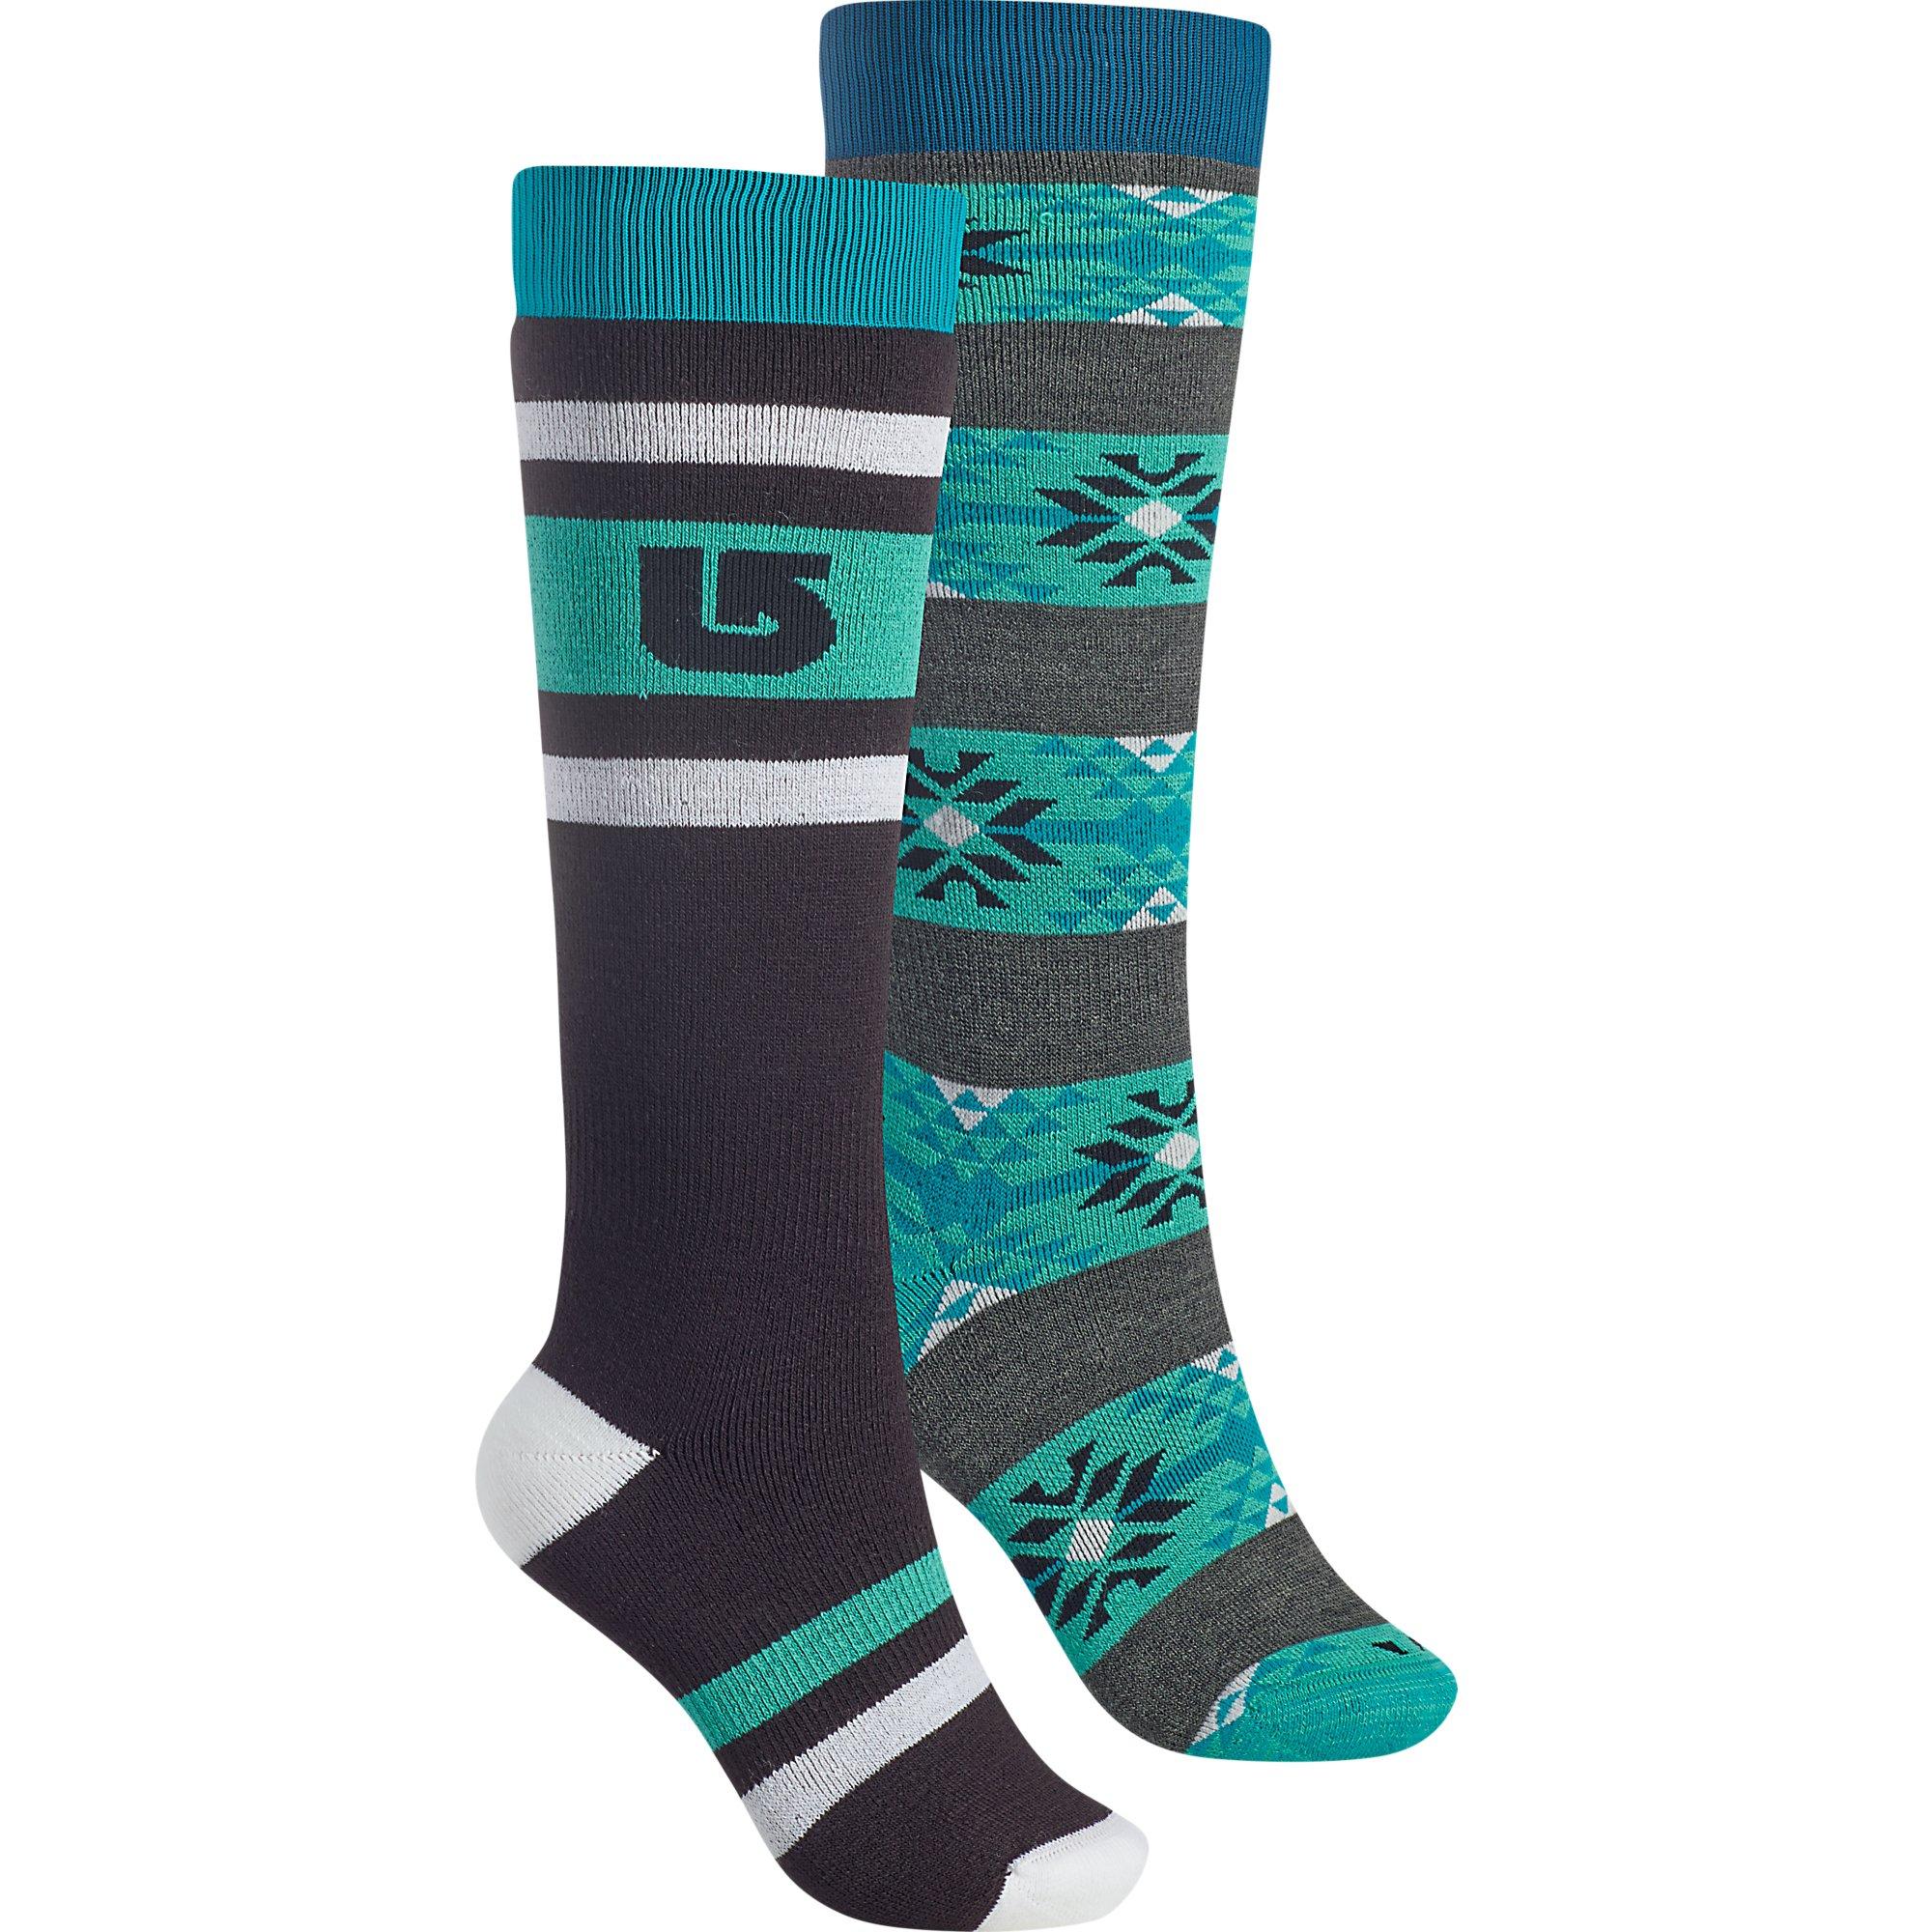 Burton Women's Weekend Socks (2 Pack), True Black, Medium/Large by Burton